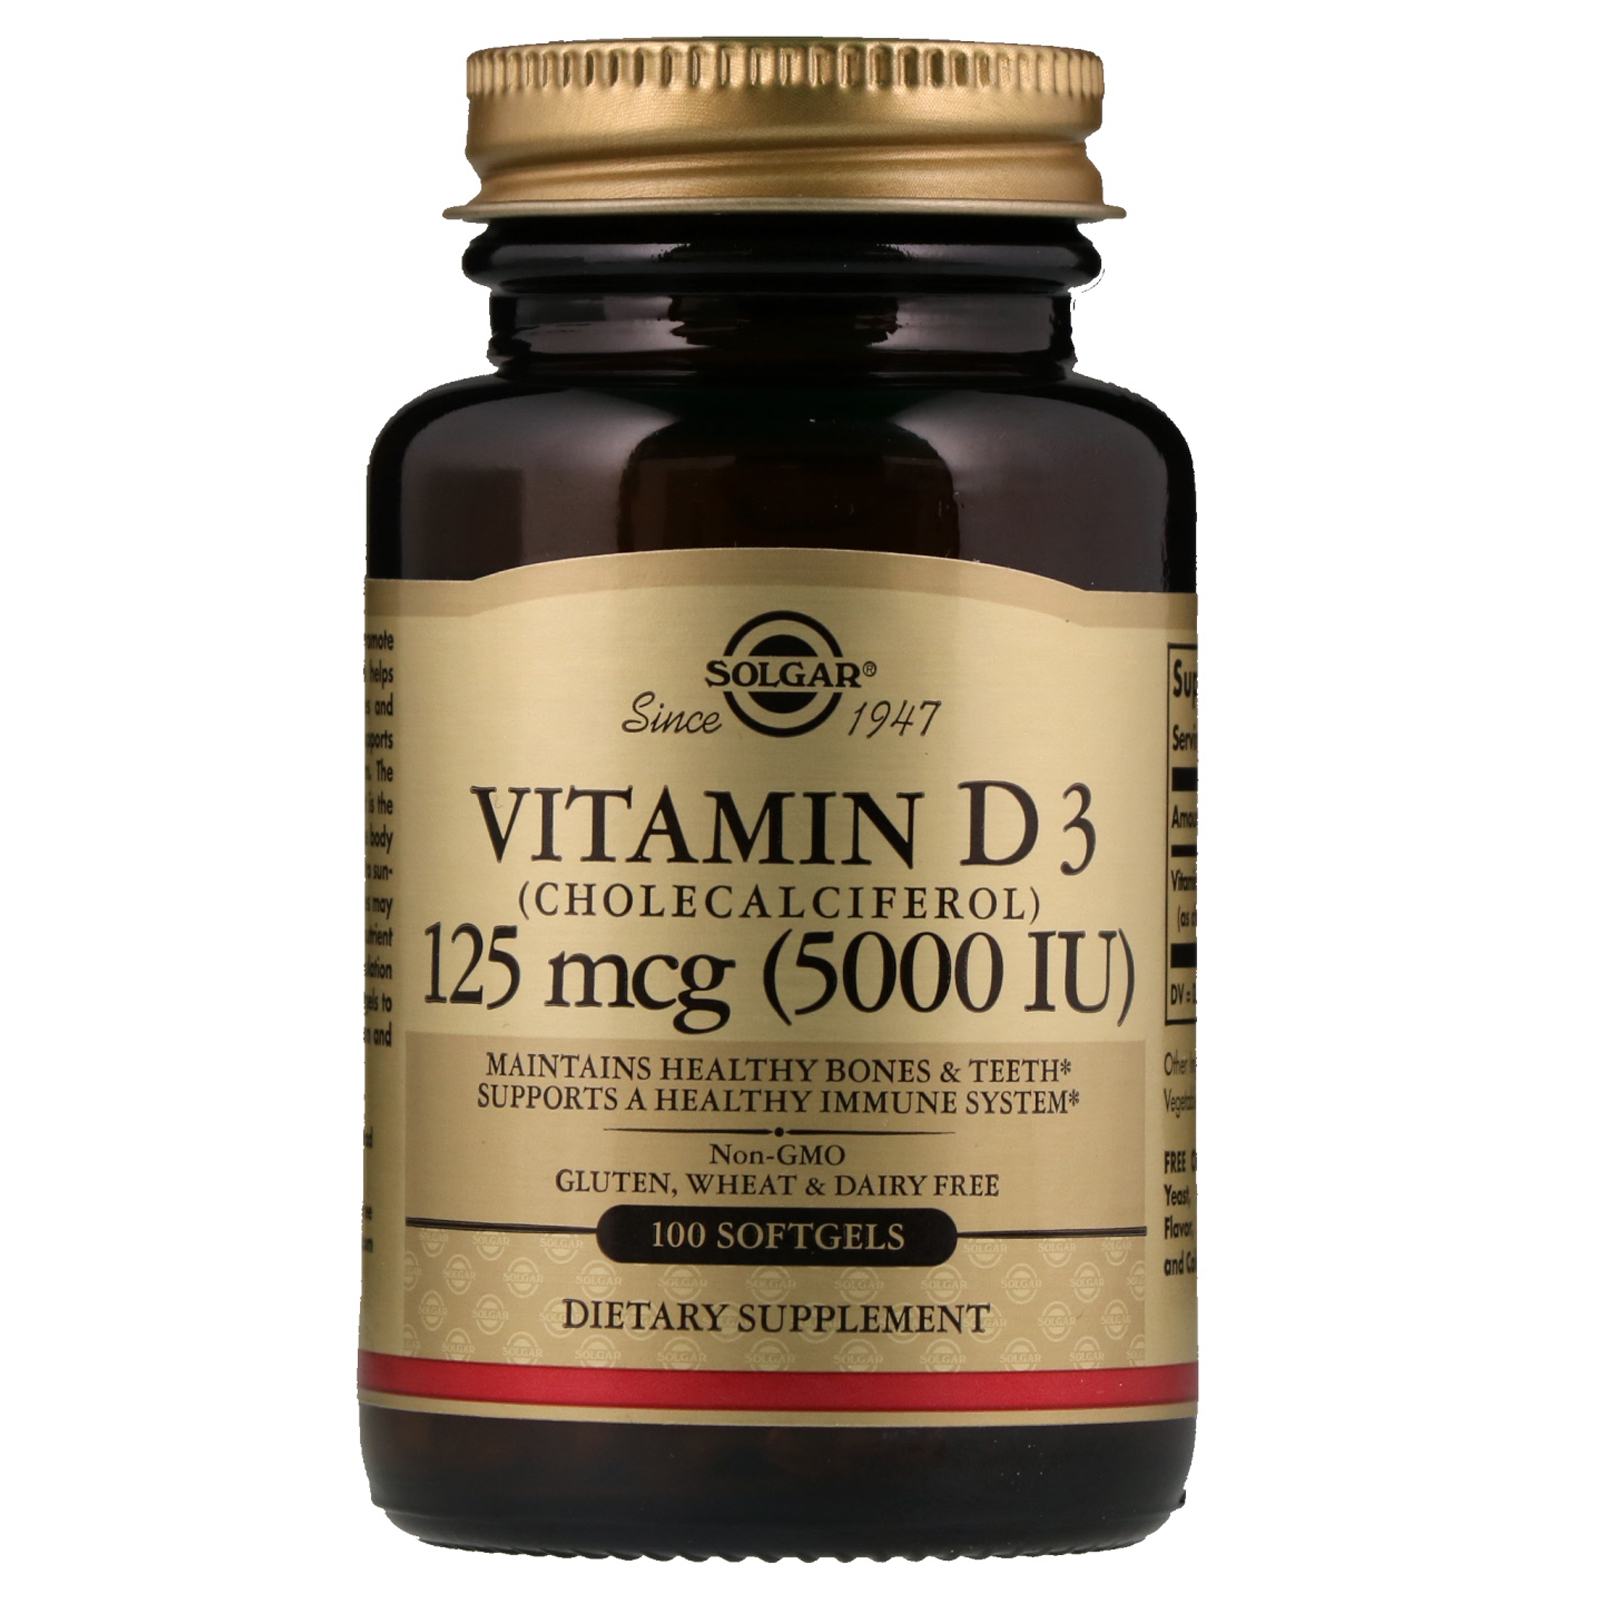 Vitamin D3 Berechnen : solgar vitamin d3 cholecalciferol 5 000 iu 100 softgels ~ Themetempest.com Abrechnung